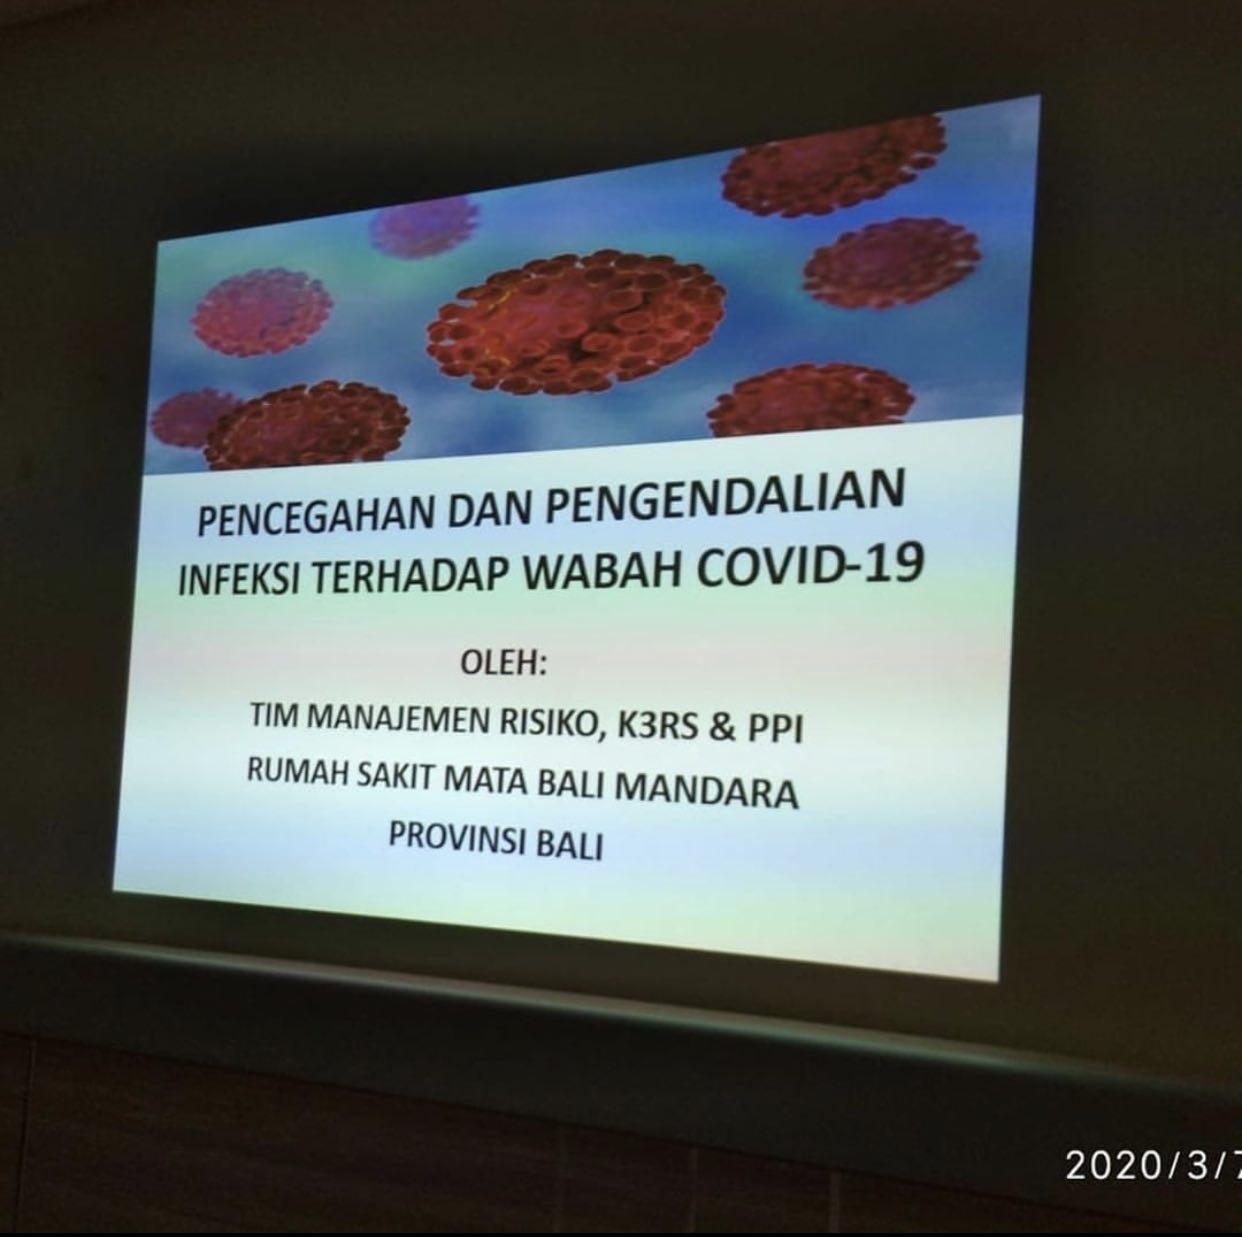 Penyuluhan Pencegahan dan Pengendalian Infeksi terhadap Wabah COVID 19